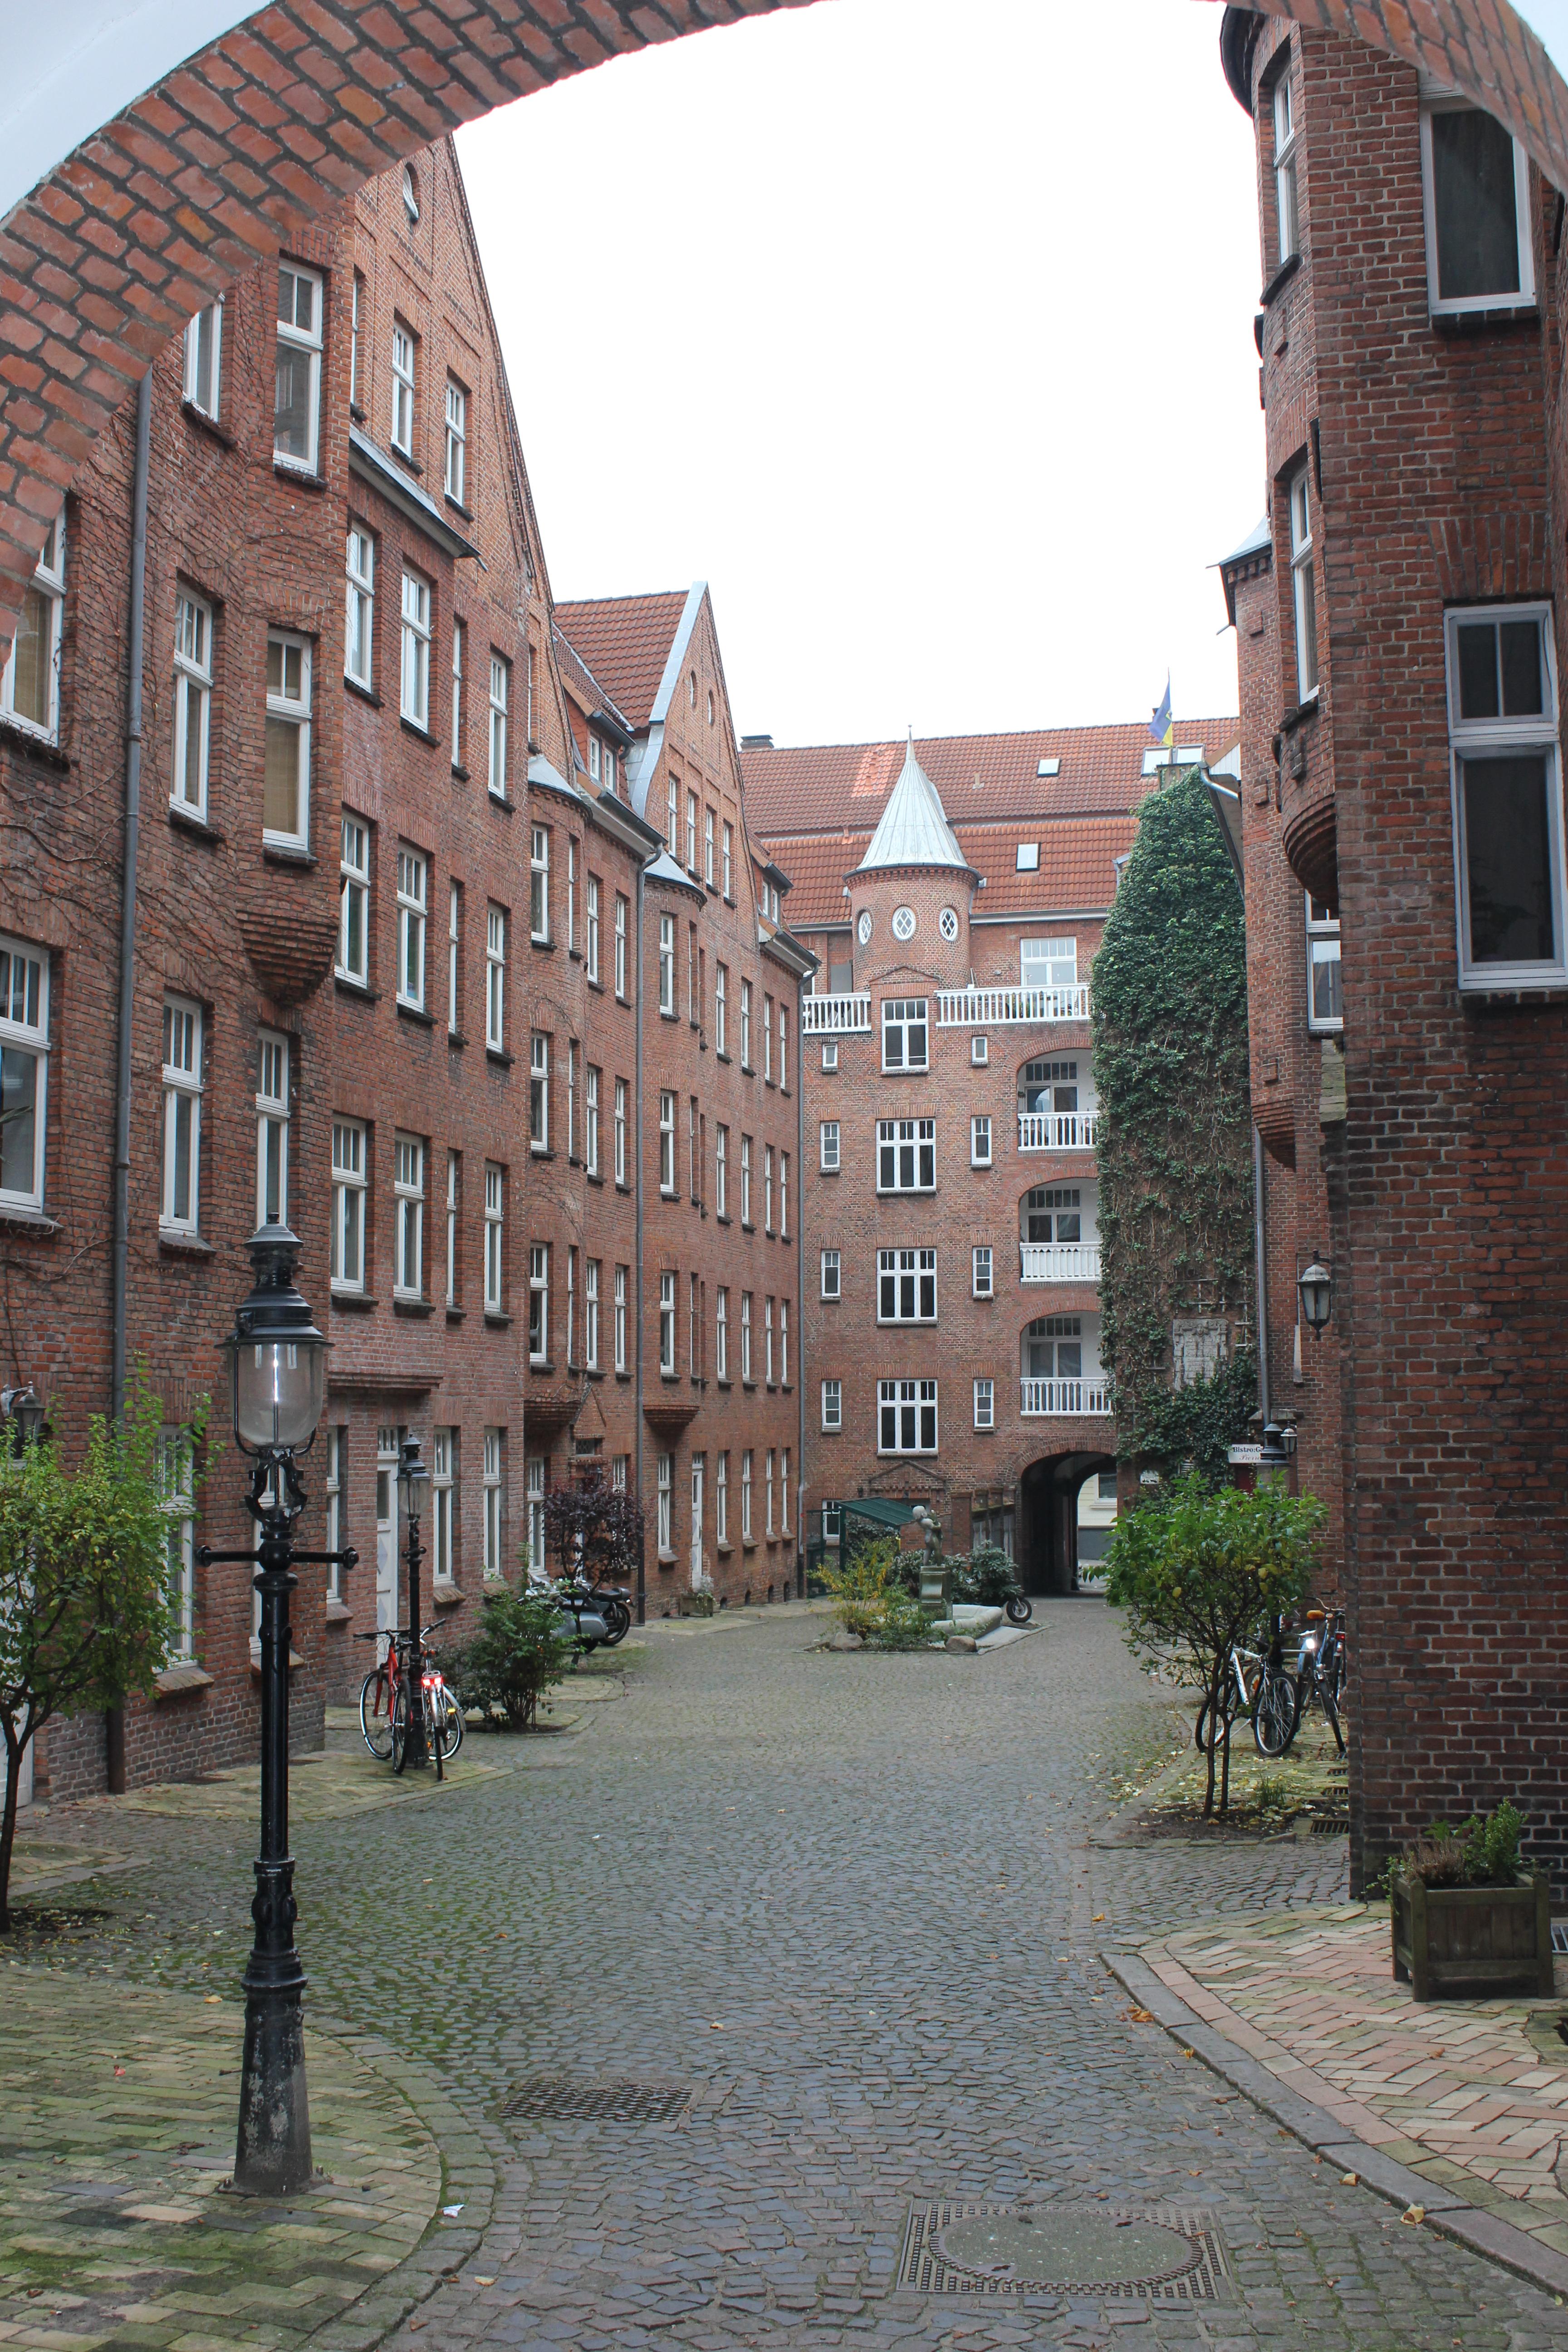 Architekt Flensburg file burghof flensburg jpg wikimedia commons